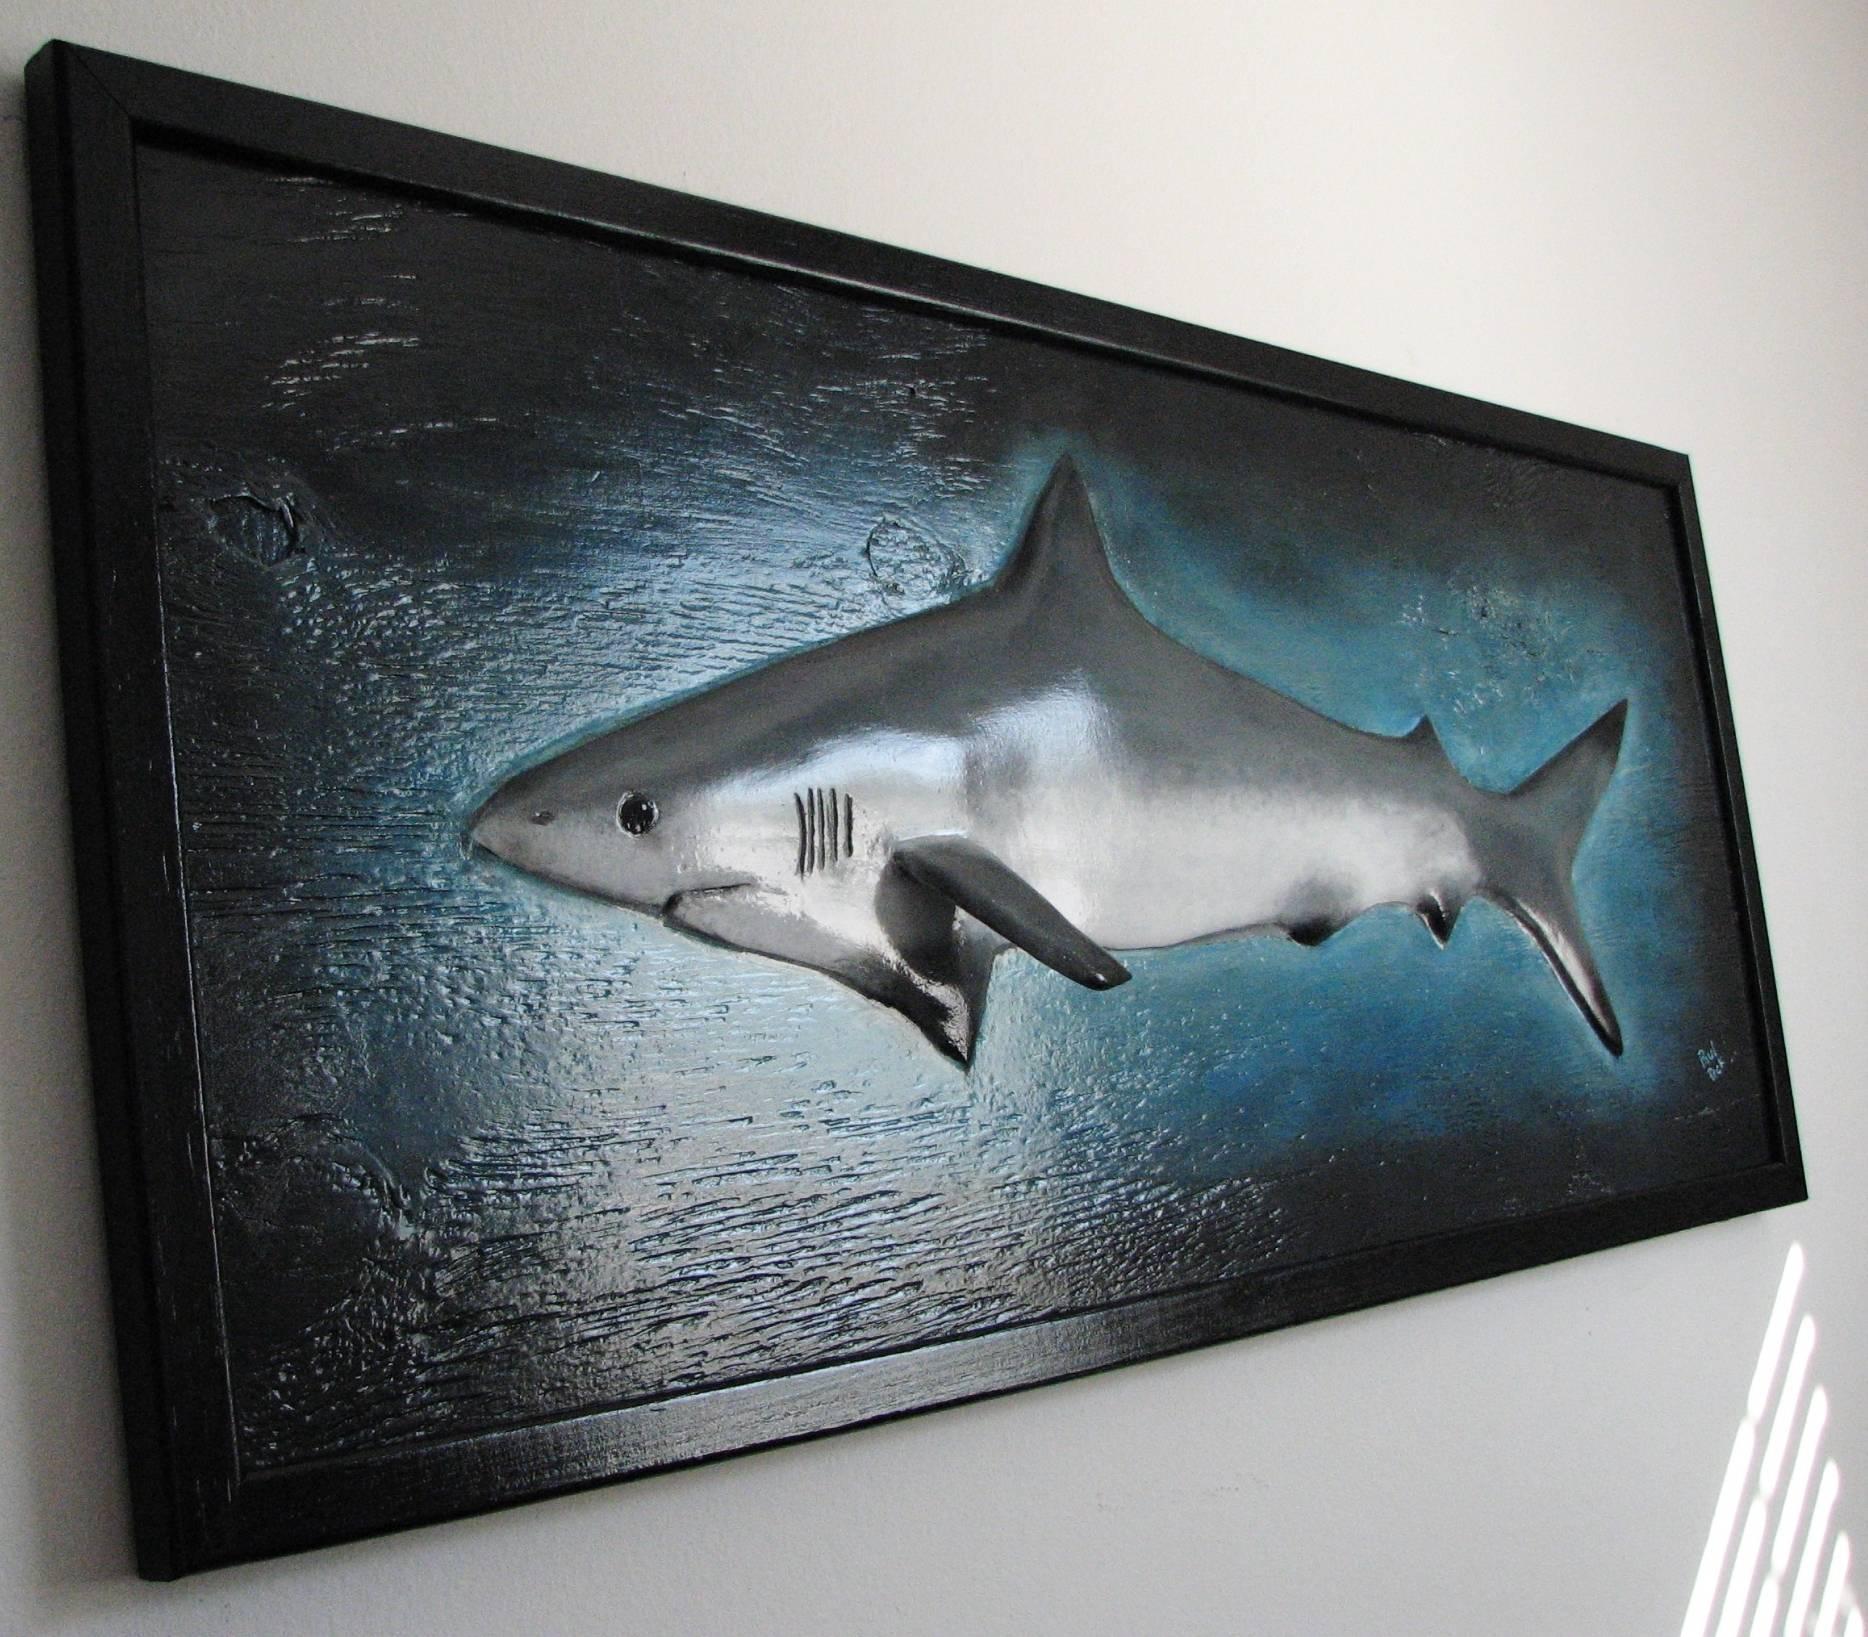 My Black Tip Shark Sculpture Completed